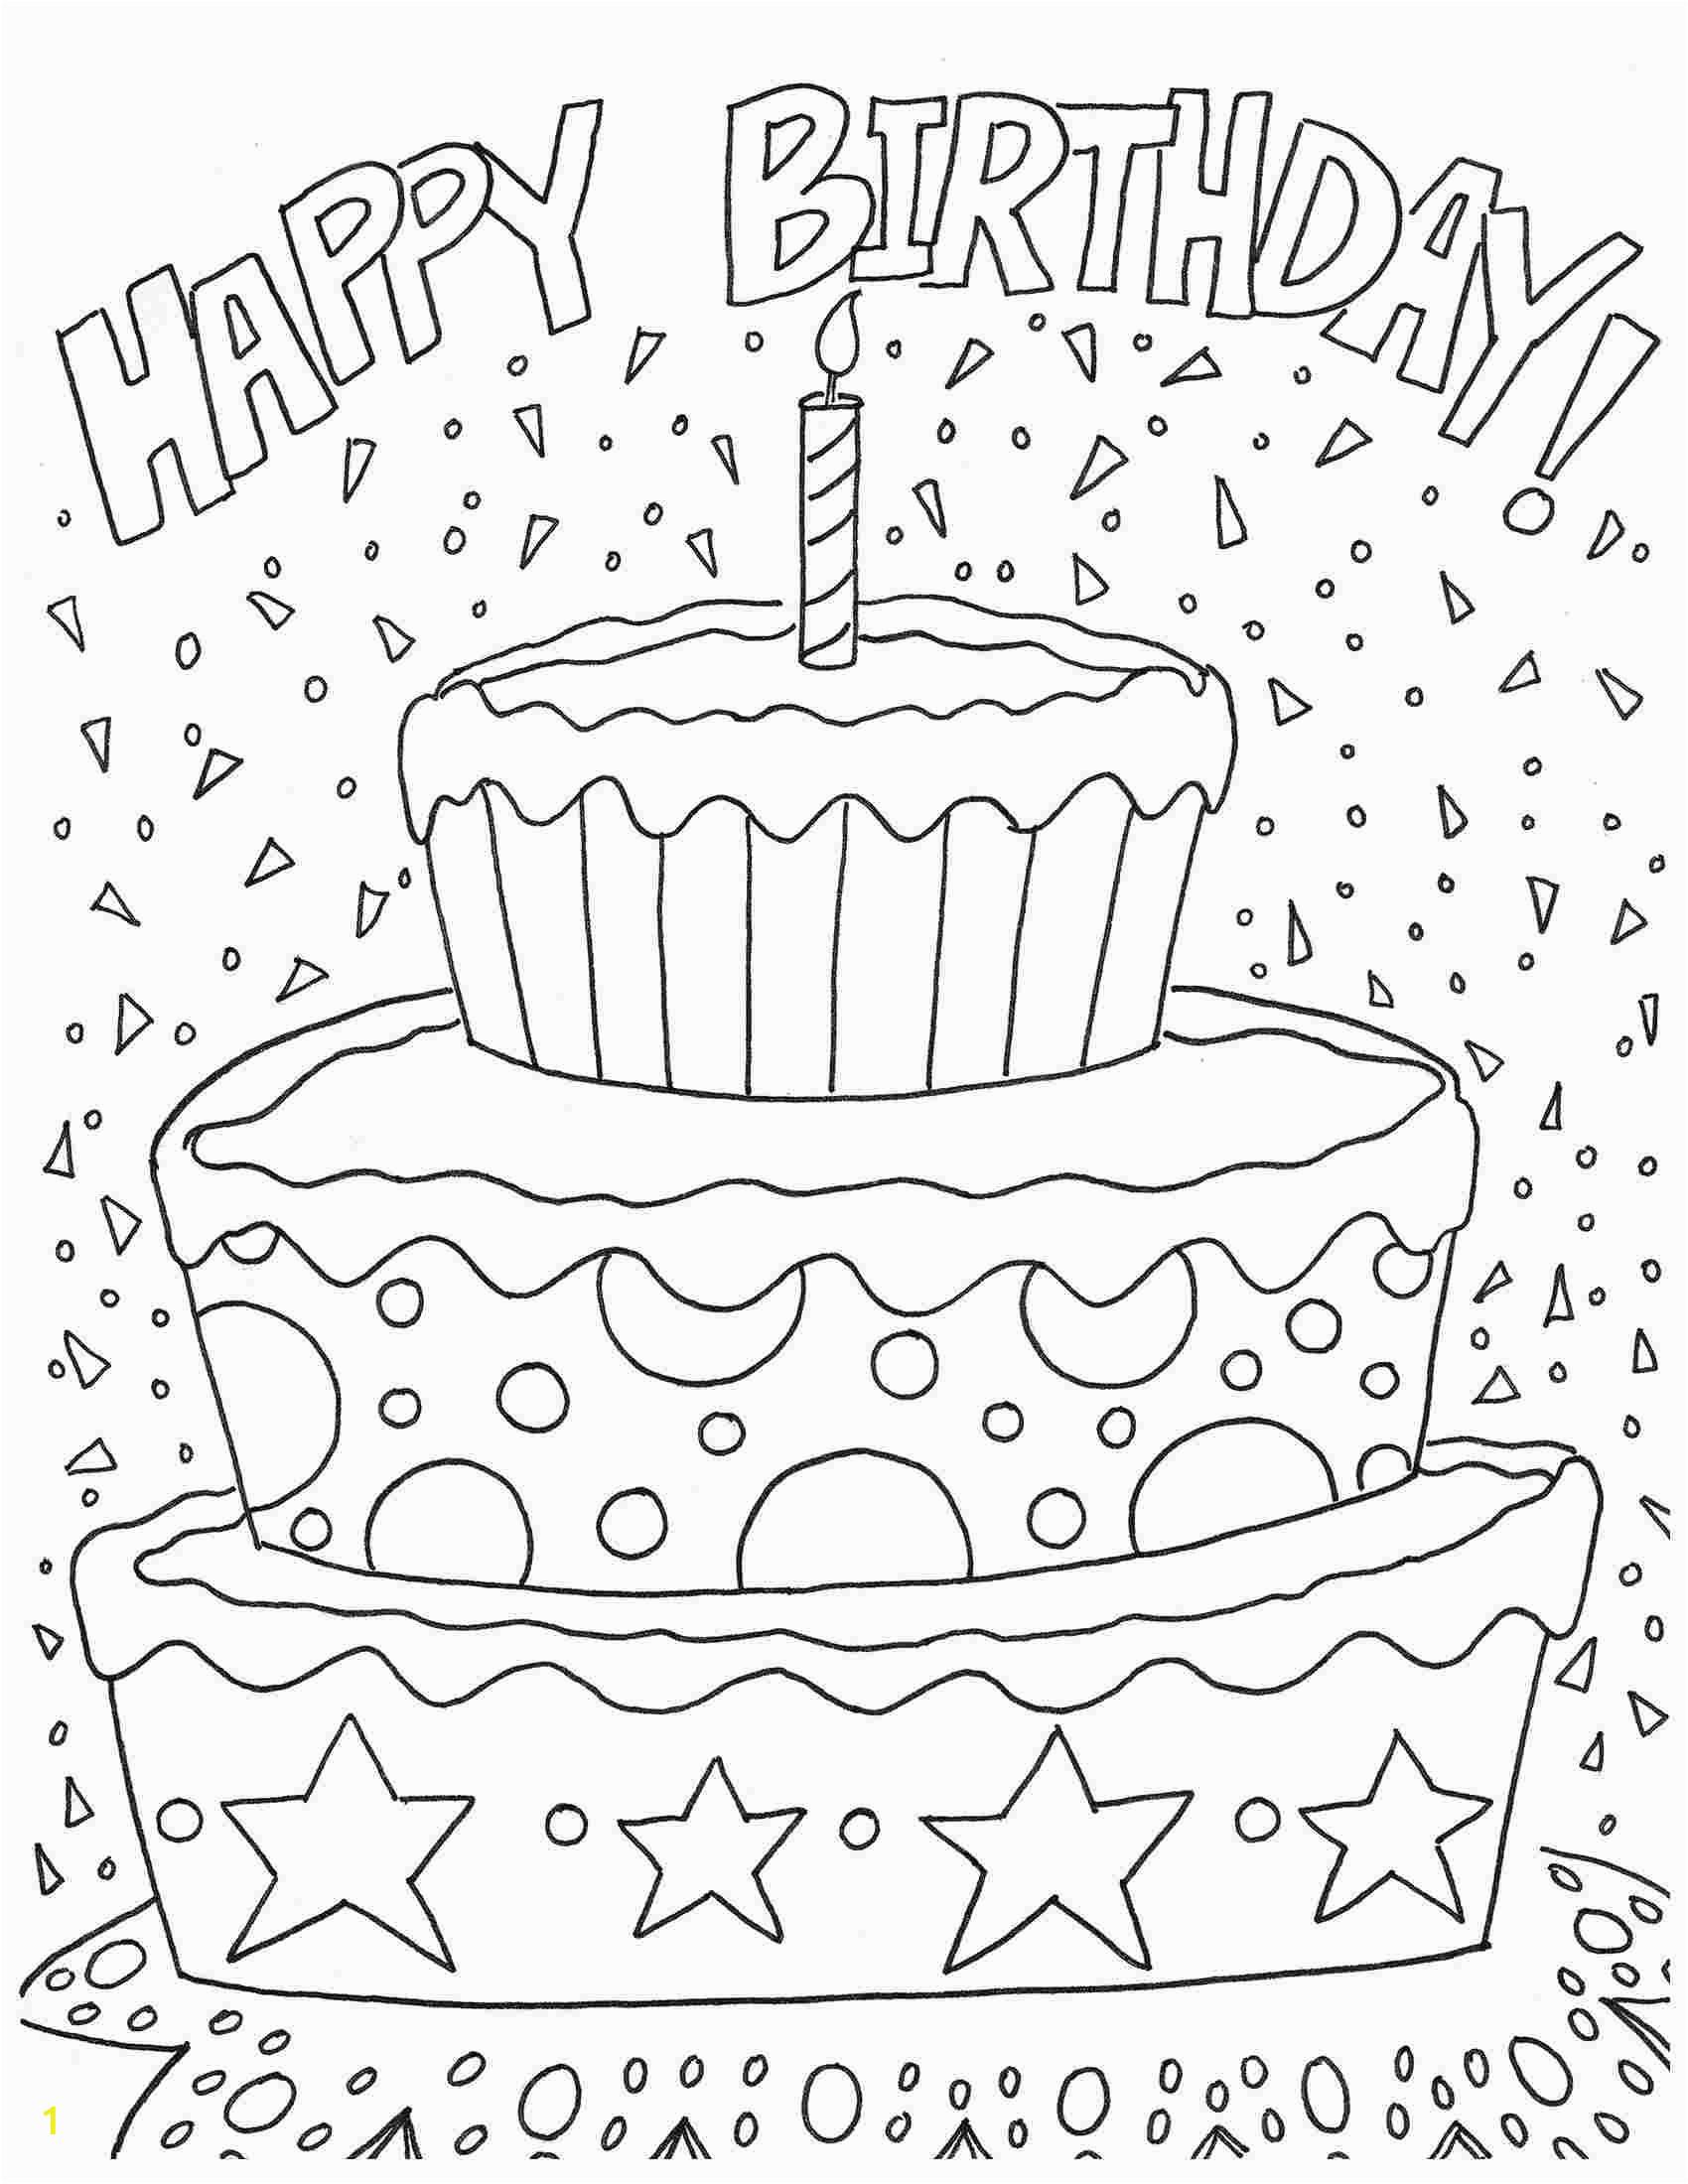 printable colouring happy birthday cards happy birthday colouring card other holidays coloring colouring printable birthday cards happy